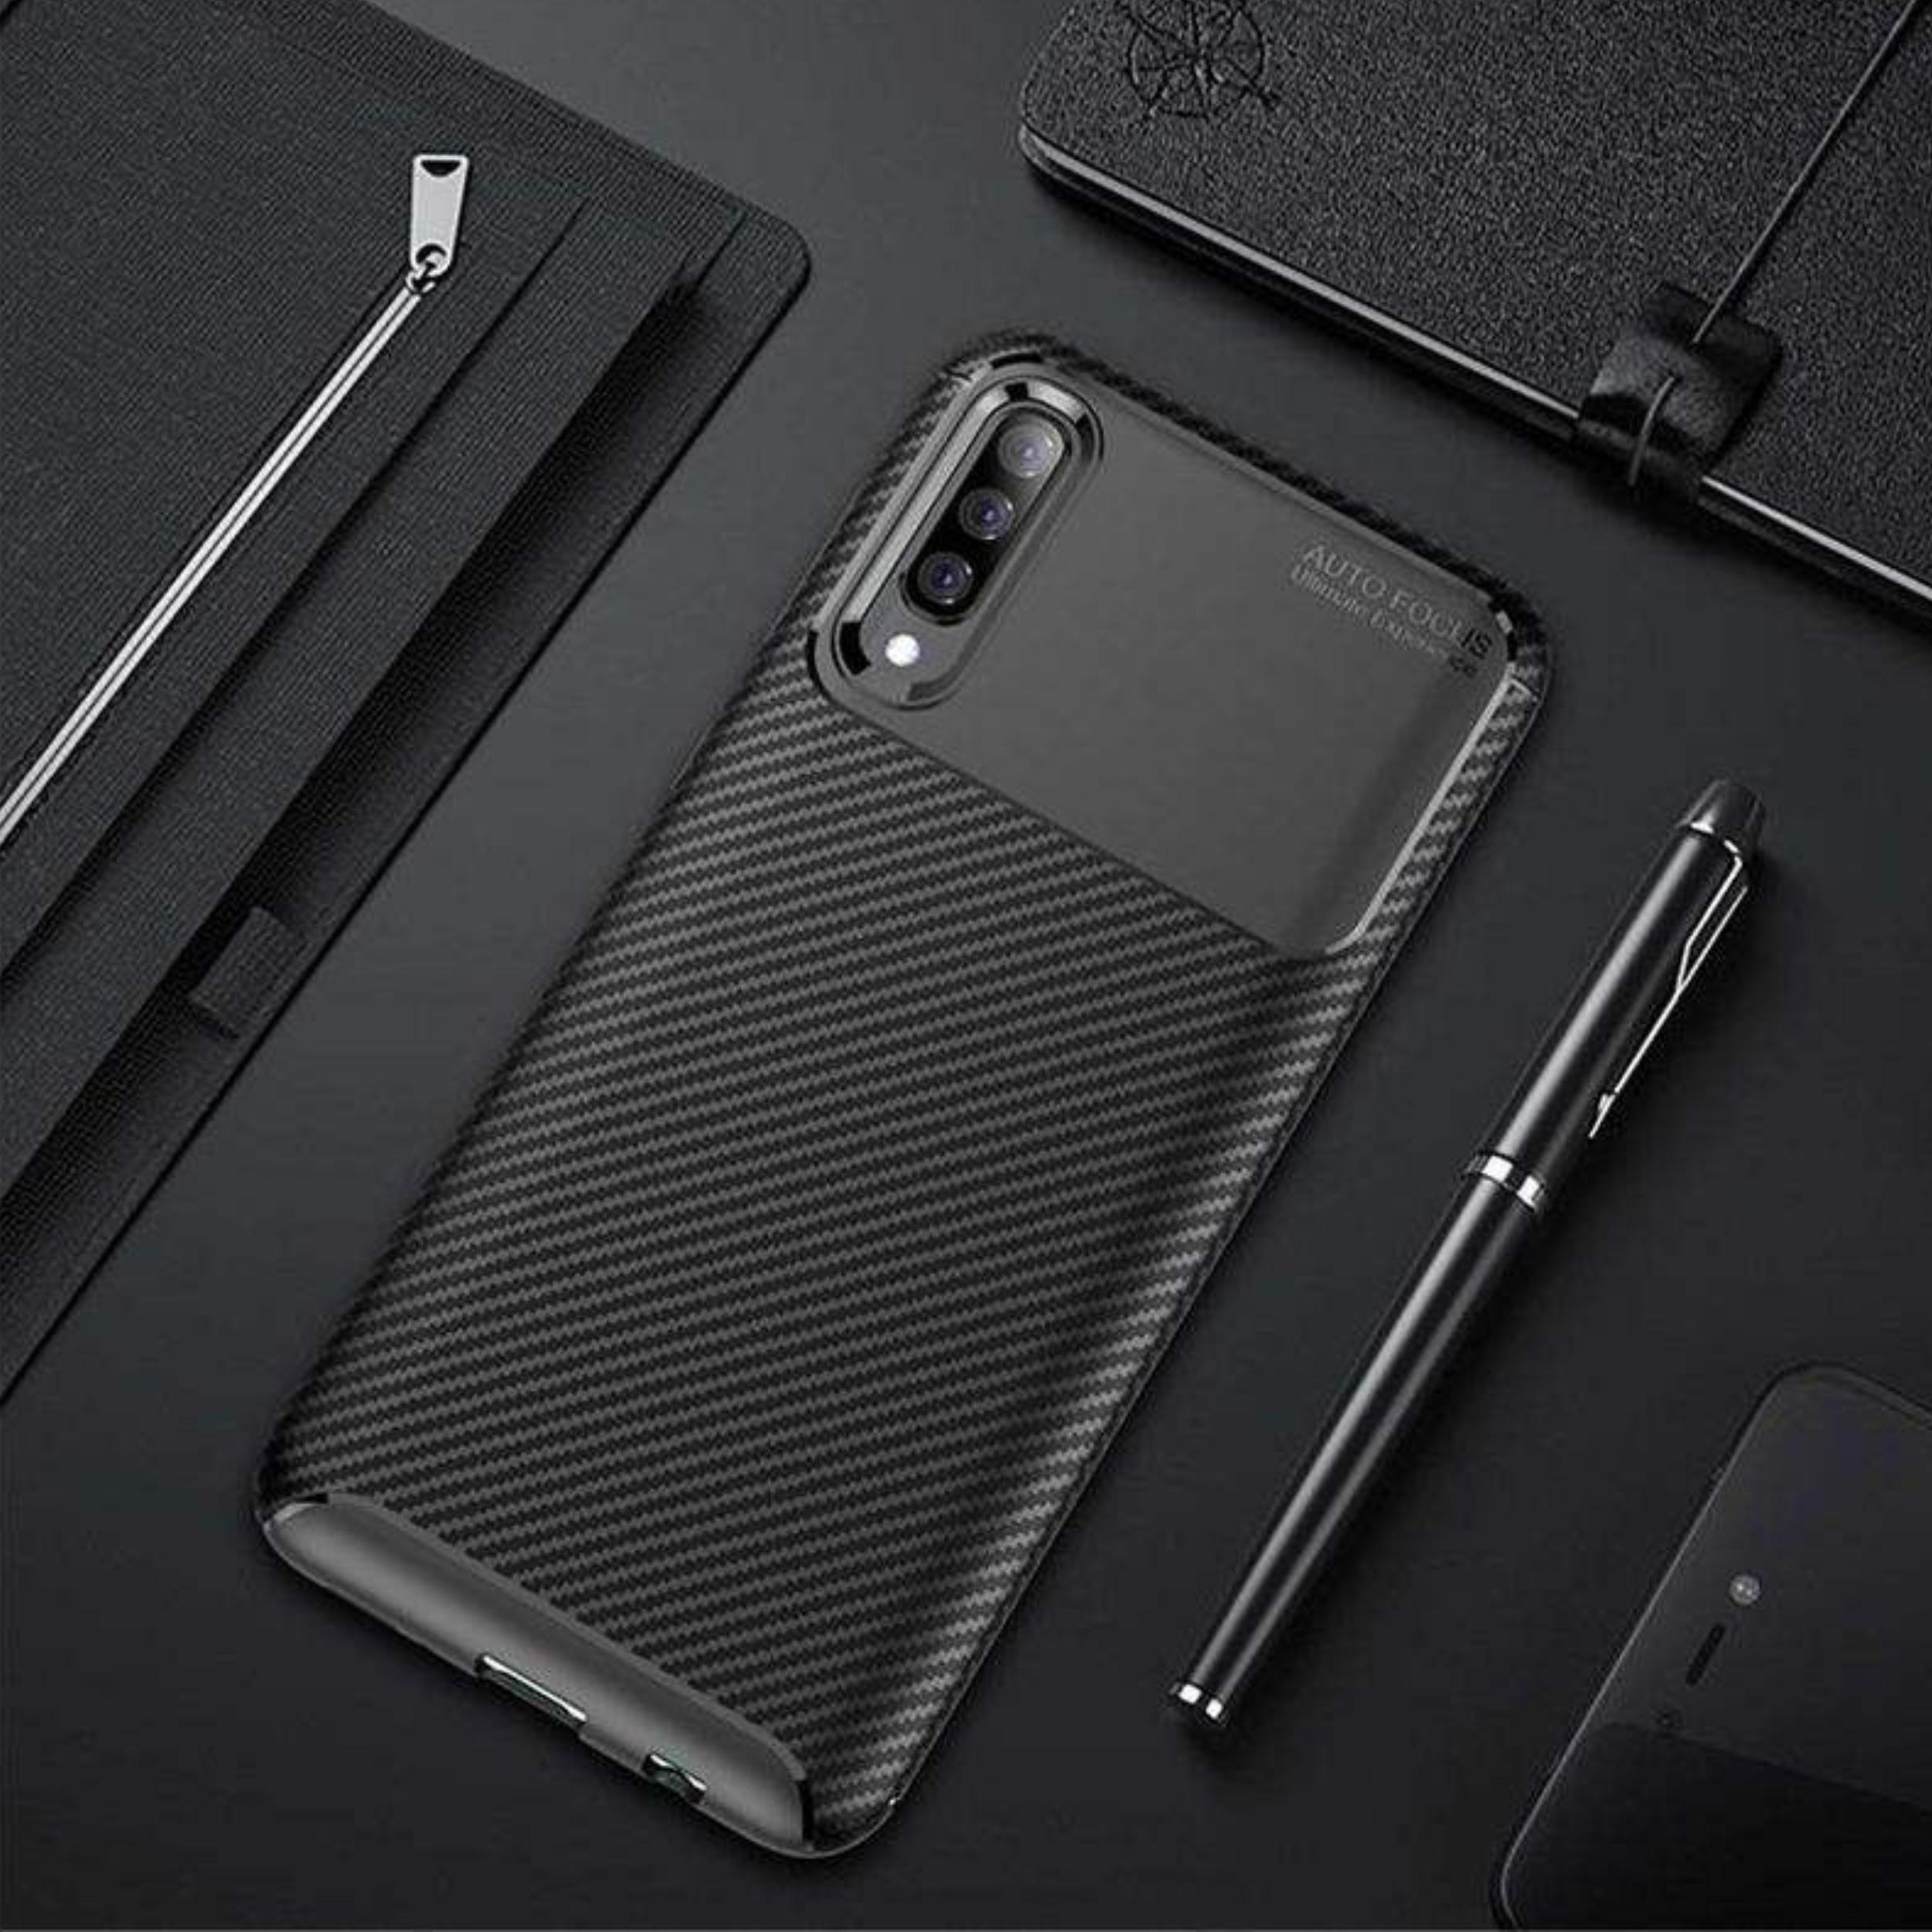 کاور لاین کینگ مدل A21 مناسب برای گوشی موبایل سامسونگ Galaxy A70/ A70S thumb 2 10